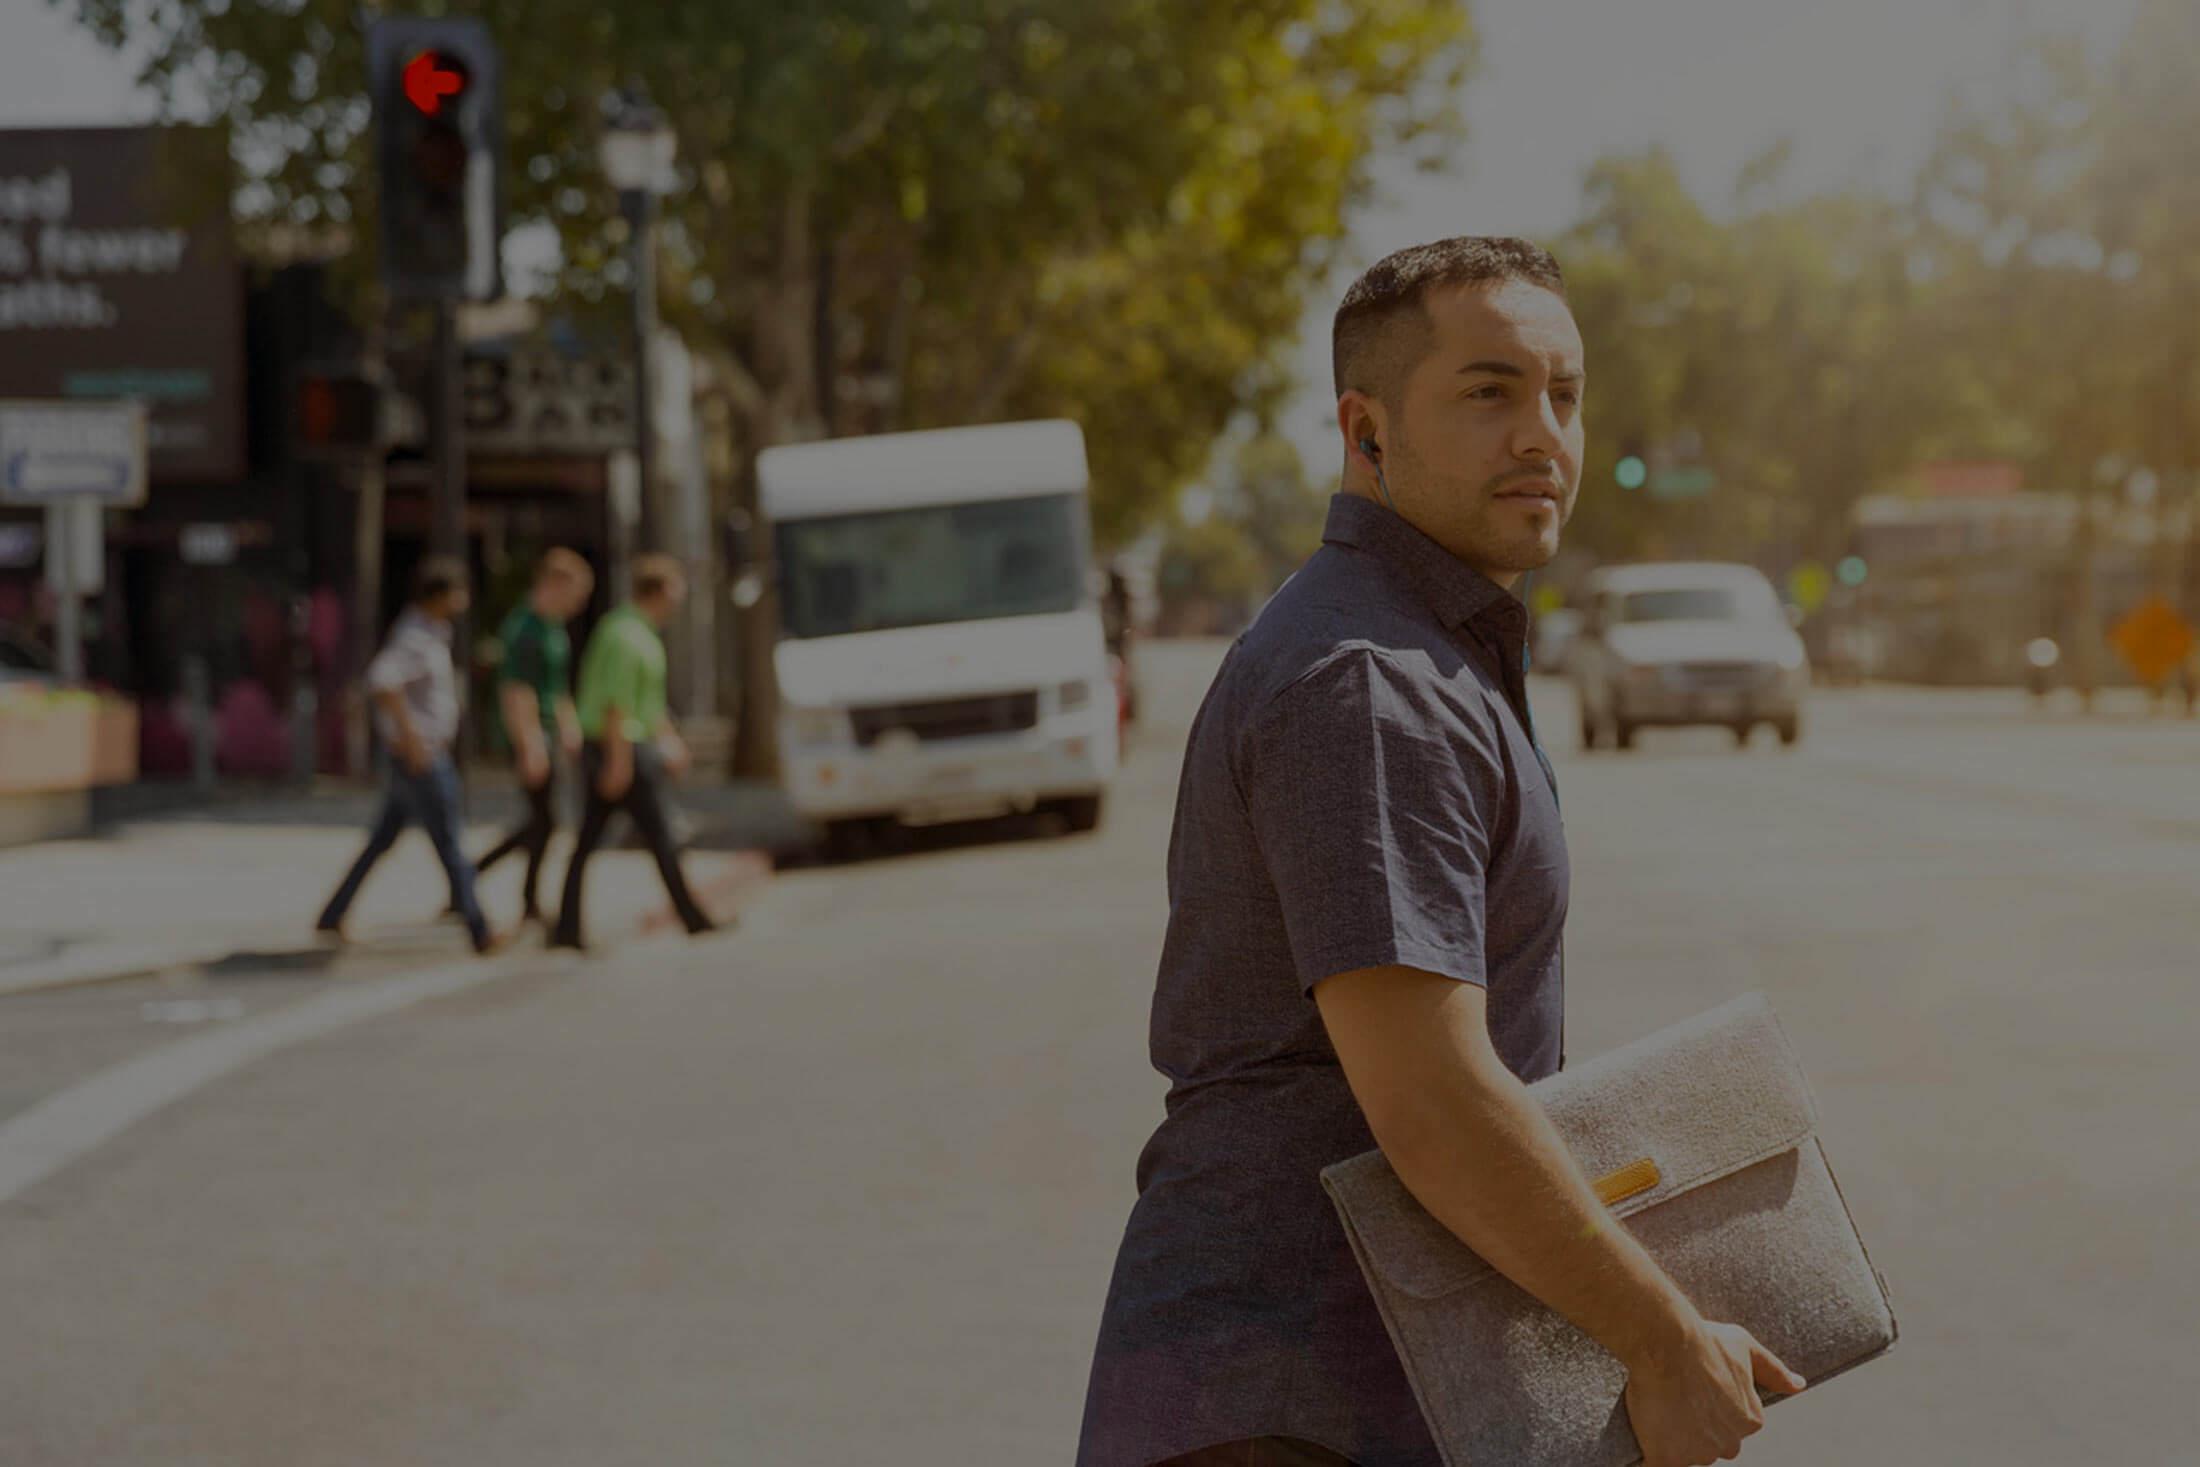 Pole emploi - offre emploi Magasinier cariste (H/F) - Challans